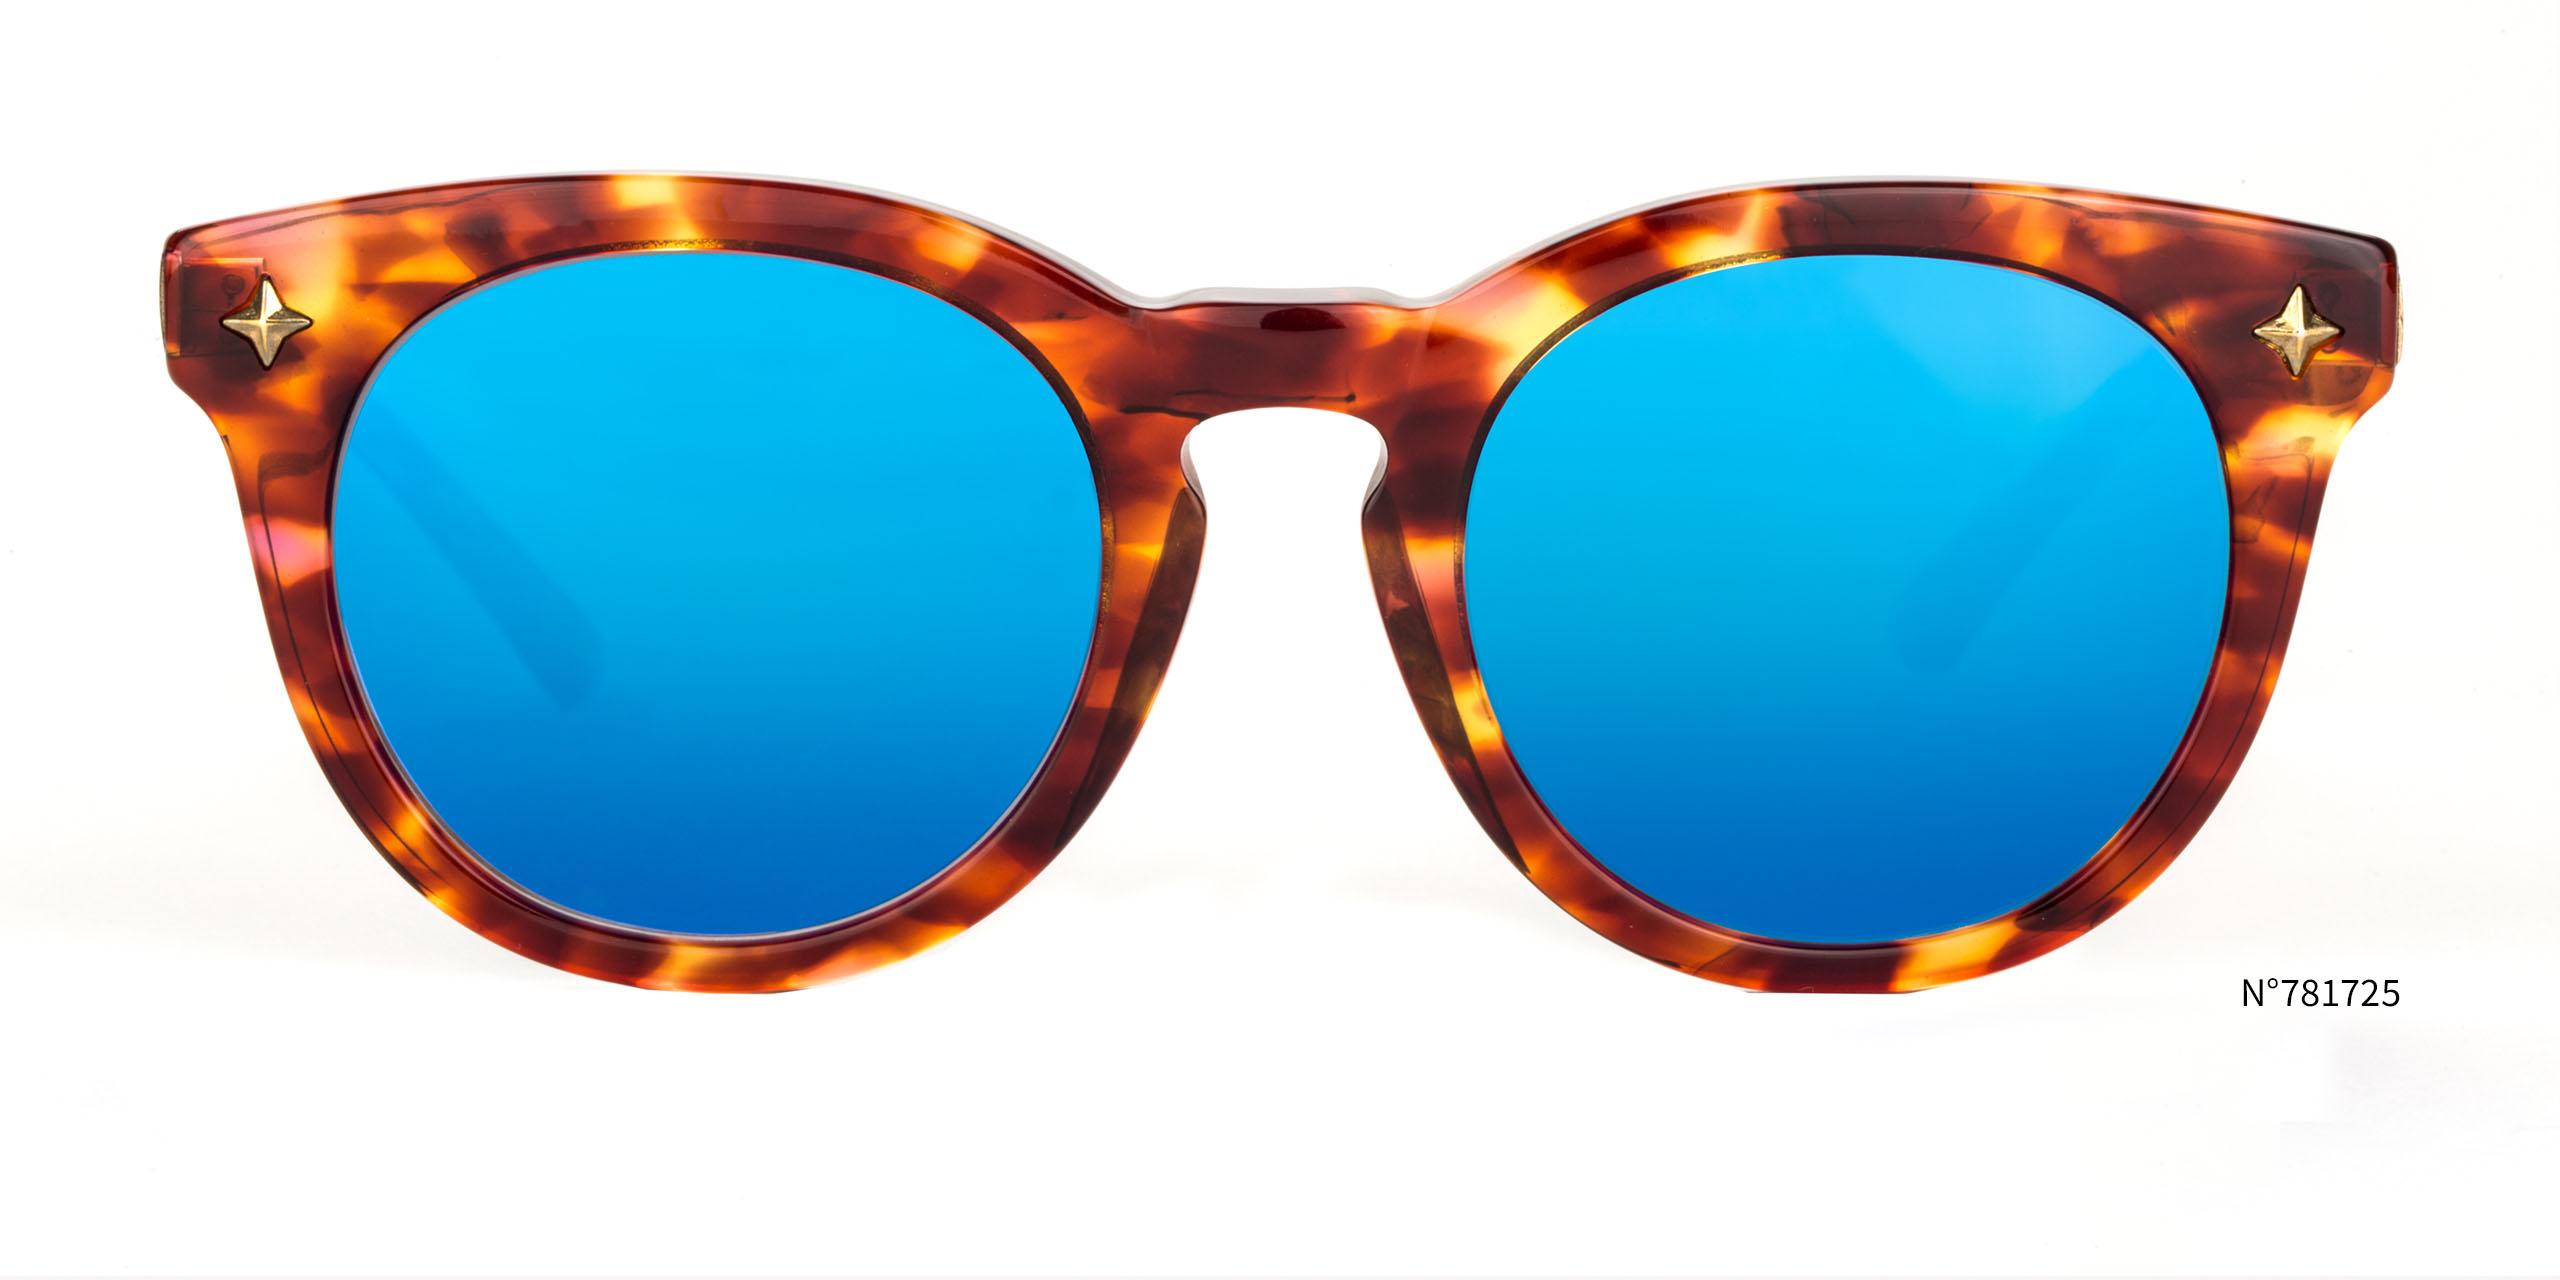 gray-blue-round-sunglasses-781725